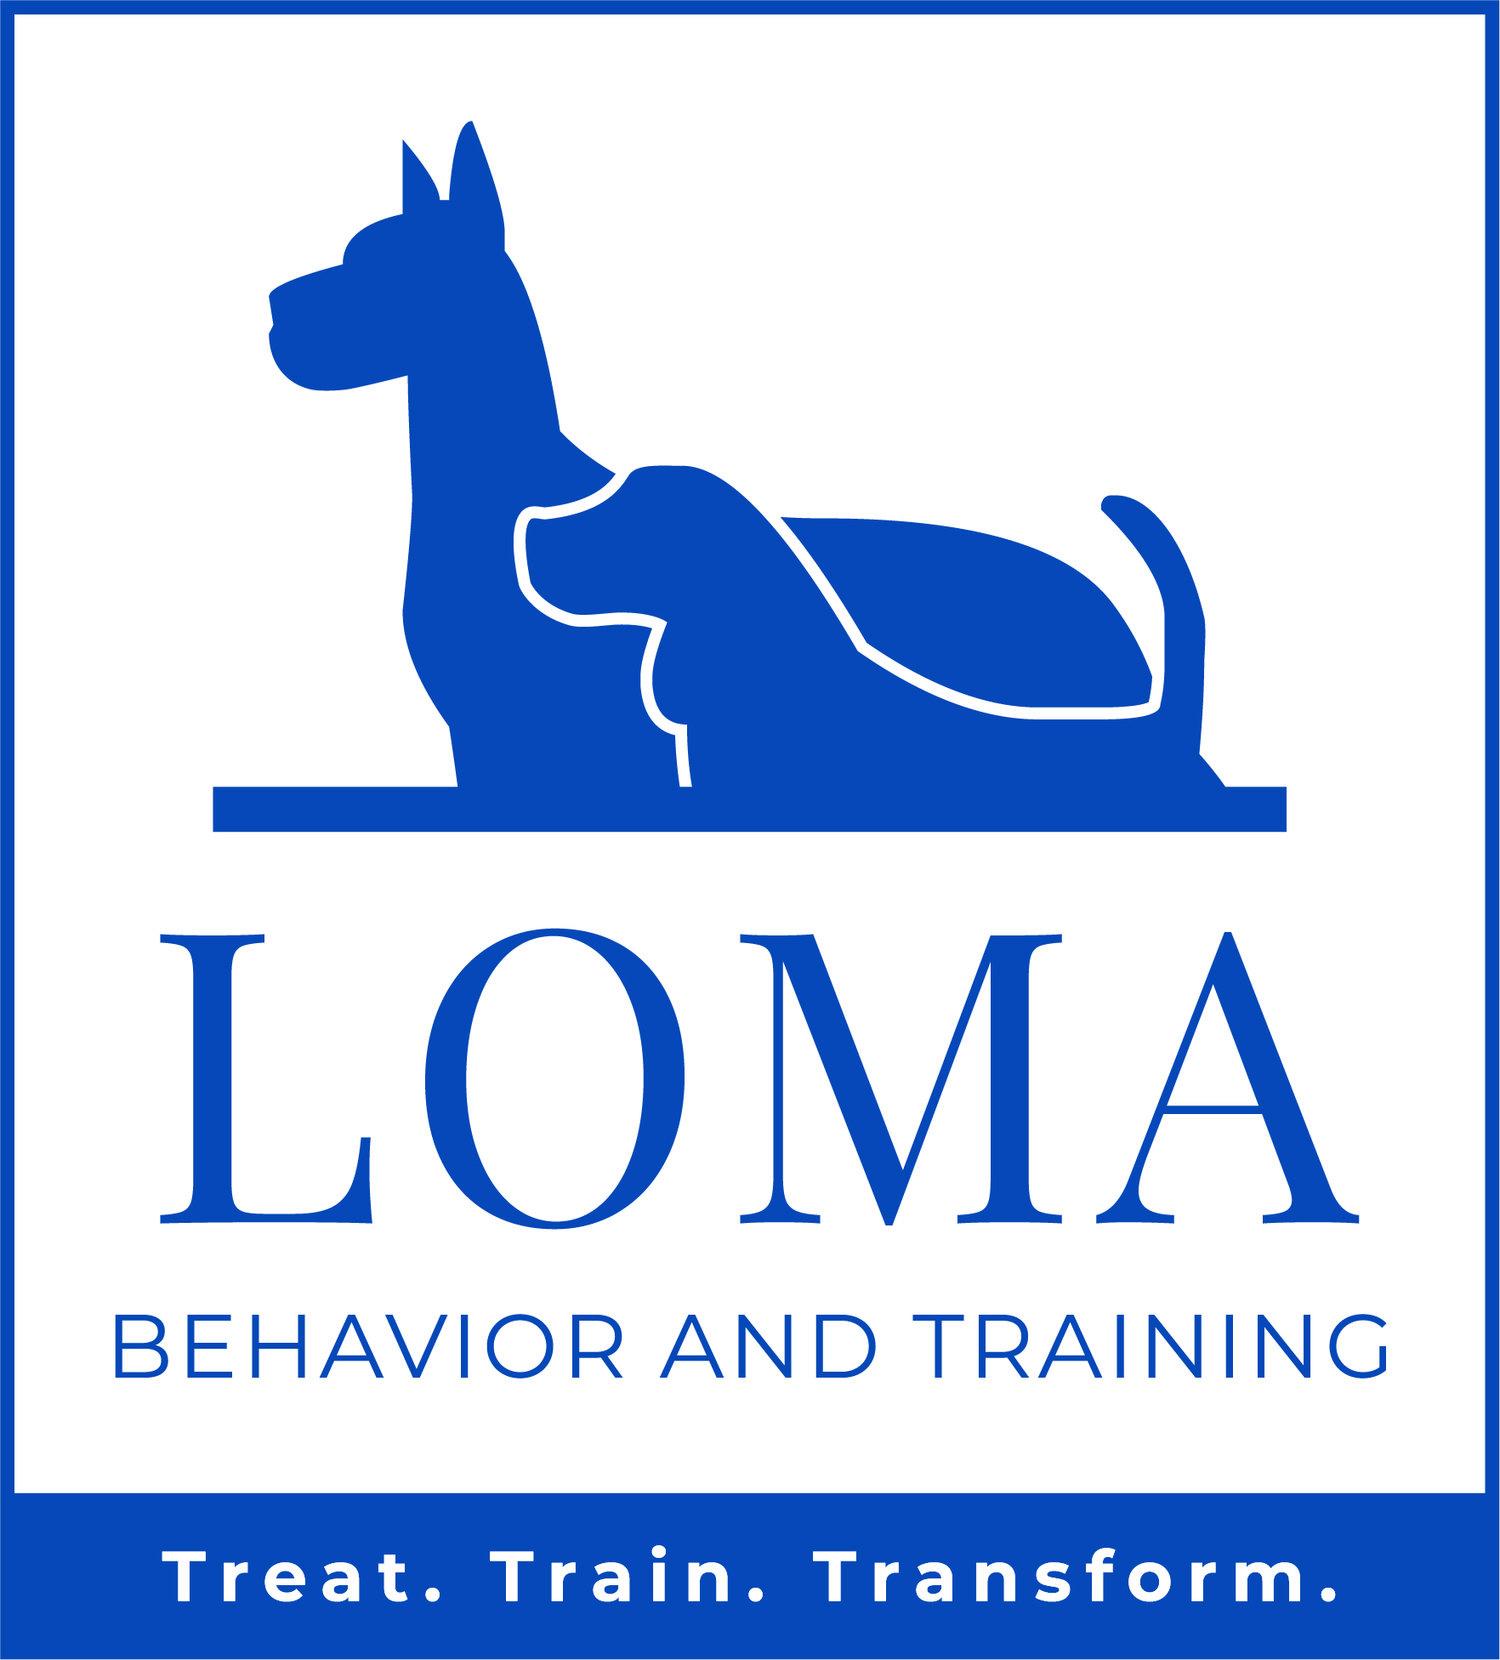 LOMA Behavior and Training for San Antonio